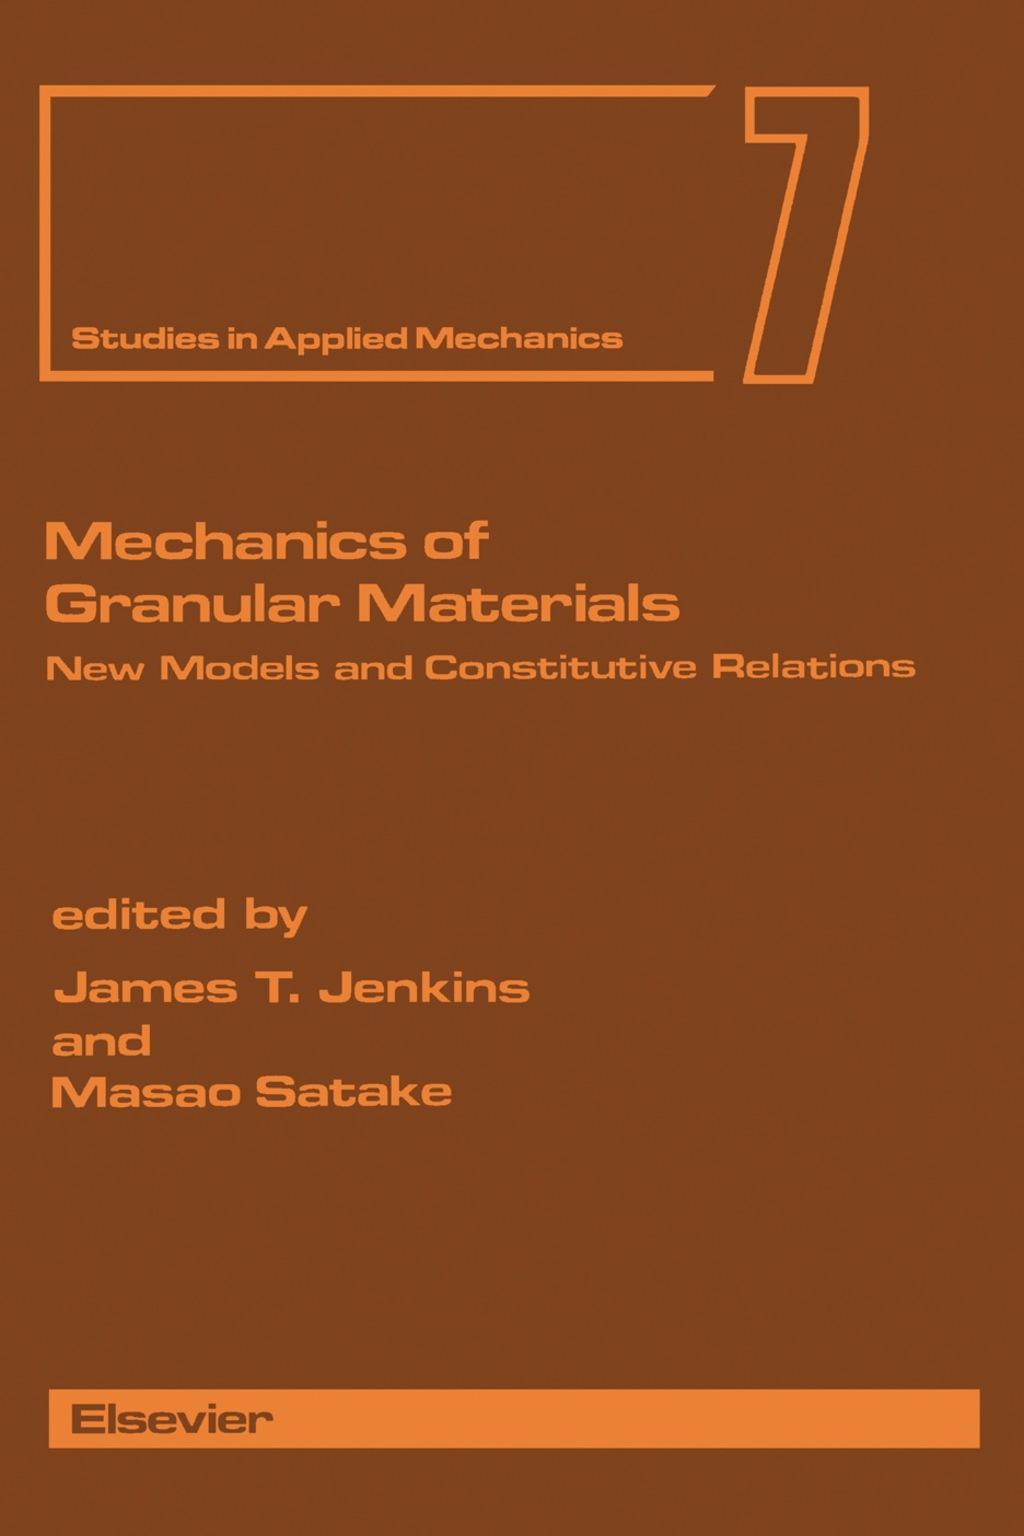 Mechanics of Granular Materials (eBook)